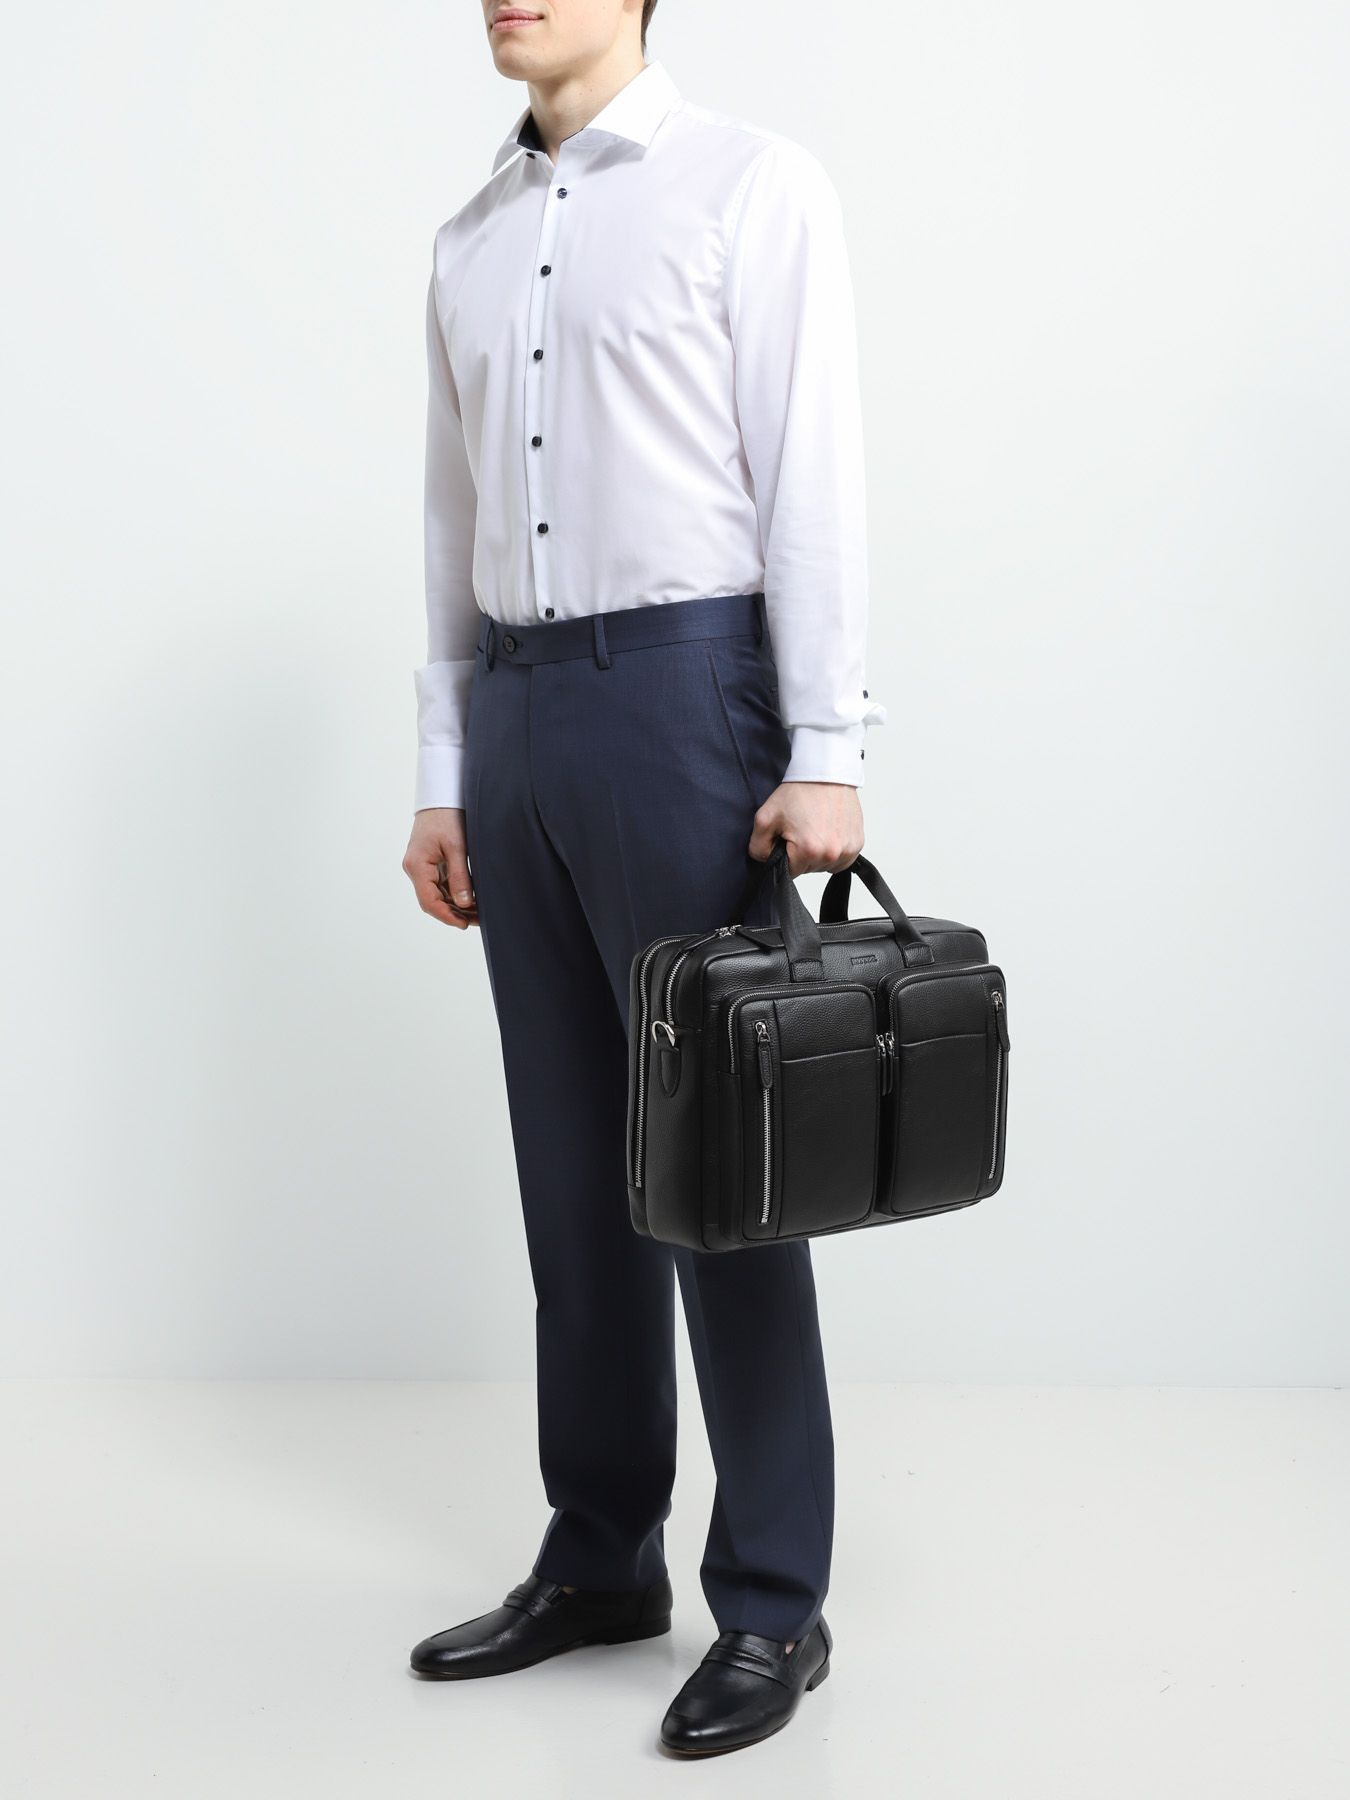 Фото - Сумка Ritter Кожаная сумка gucci черная кожаная сумка